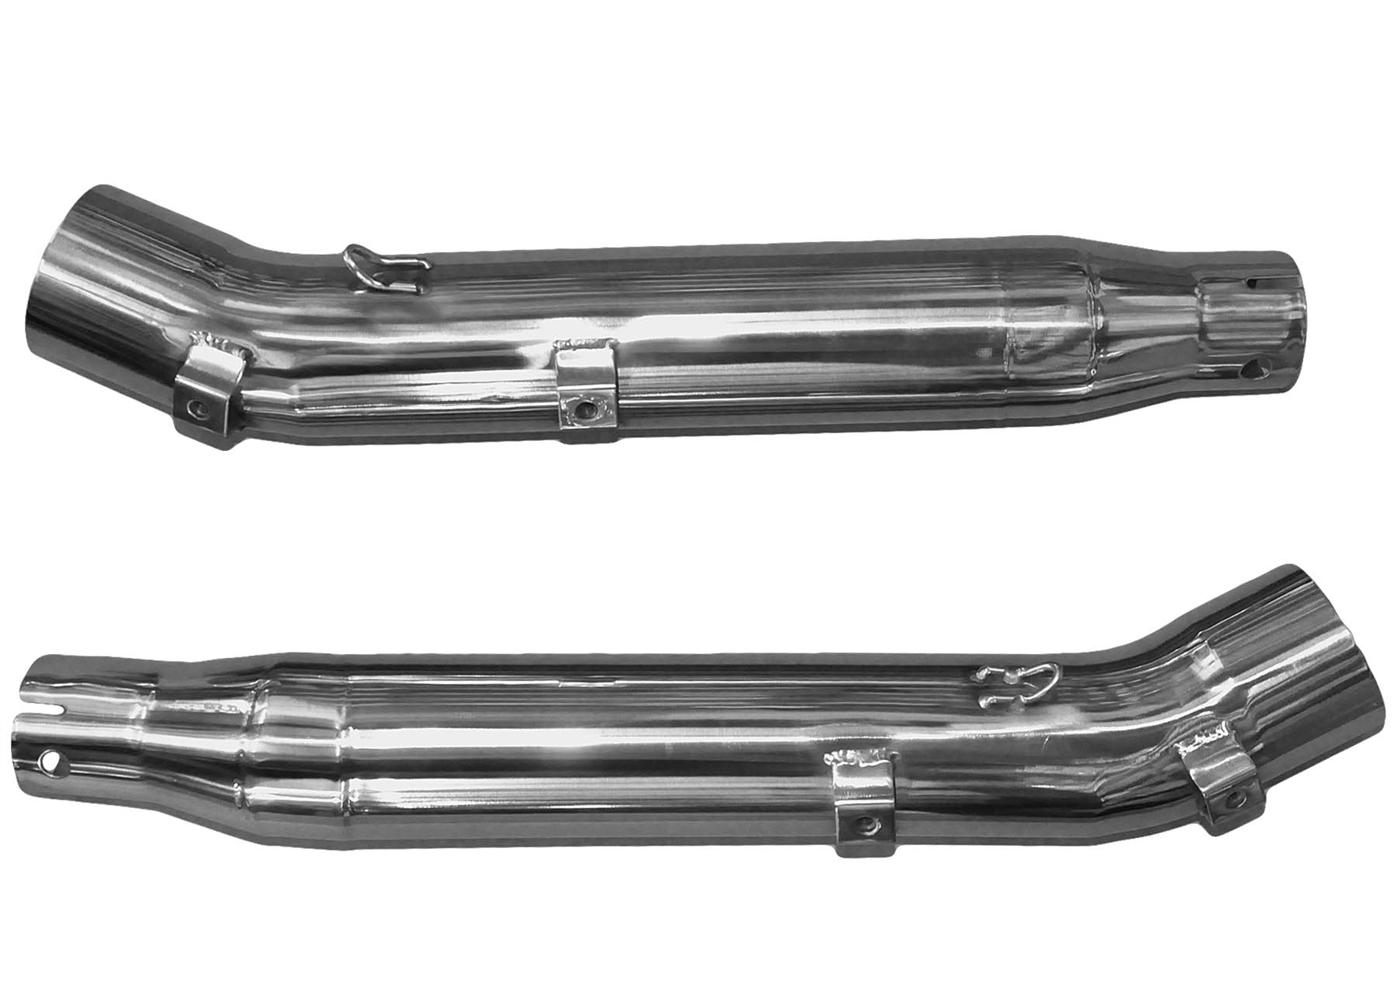 Exhaust Pipes Honda Cbr600rr Series Slip On M 2 Carbon Fiber Canister Hitam